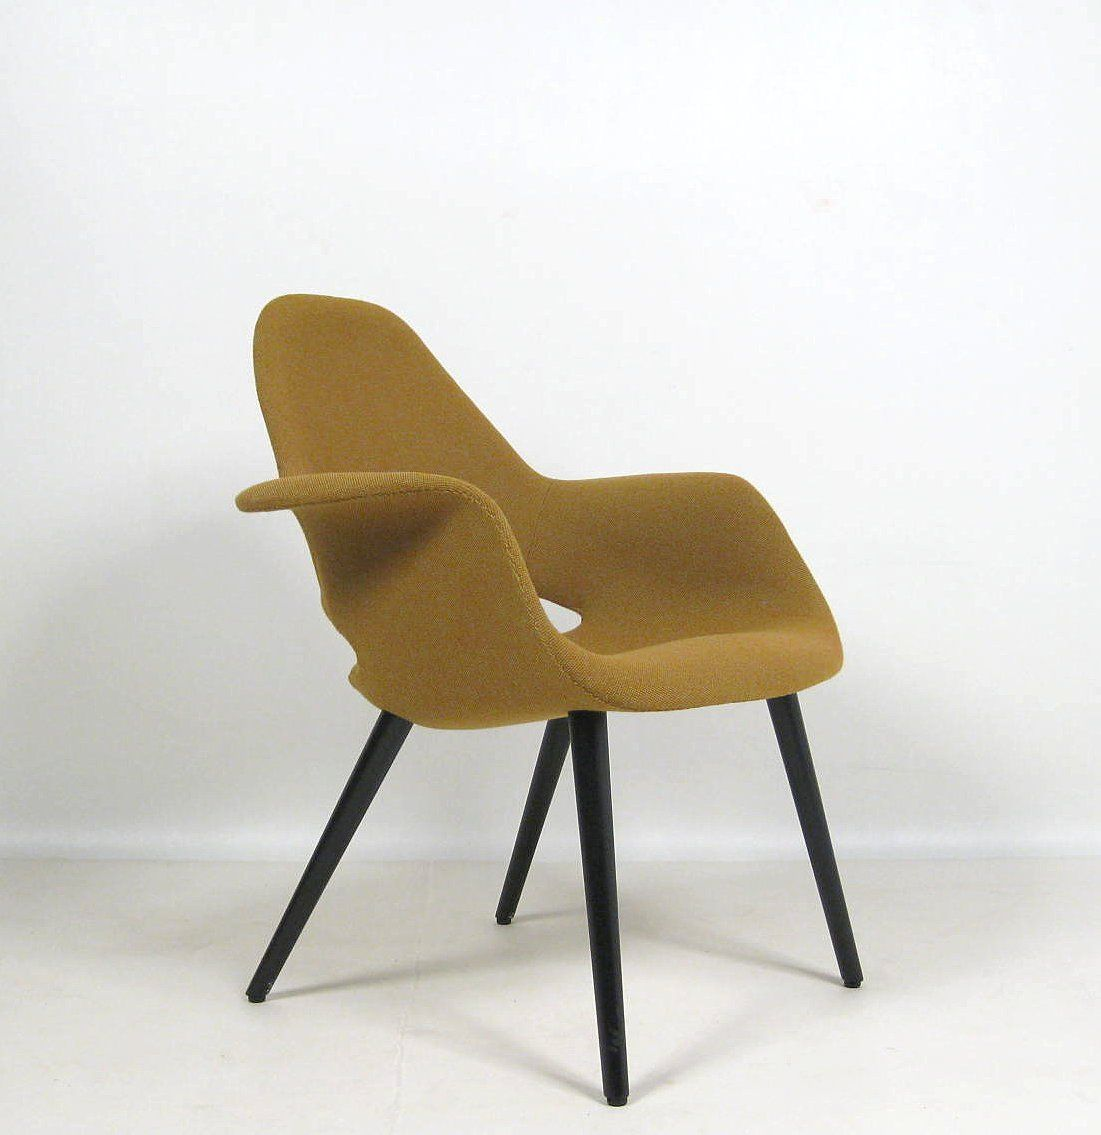 Hochwertig Charles Eames U0026 Eero Saarinen, Sessel Modell Organic Highback Chair Von  Vitra